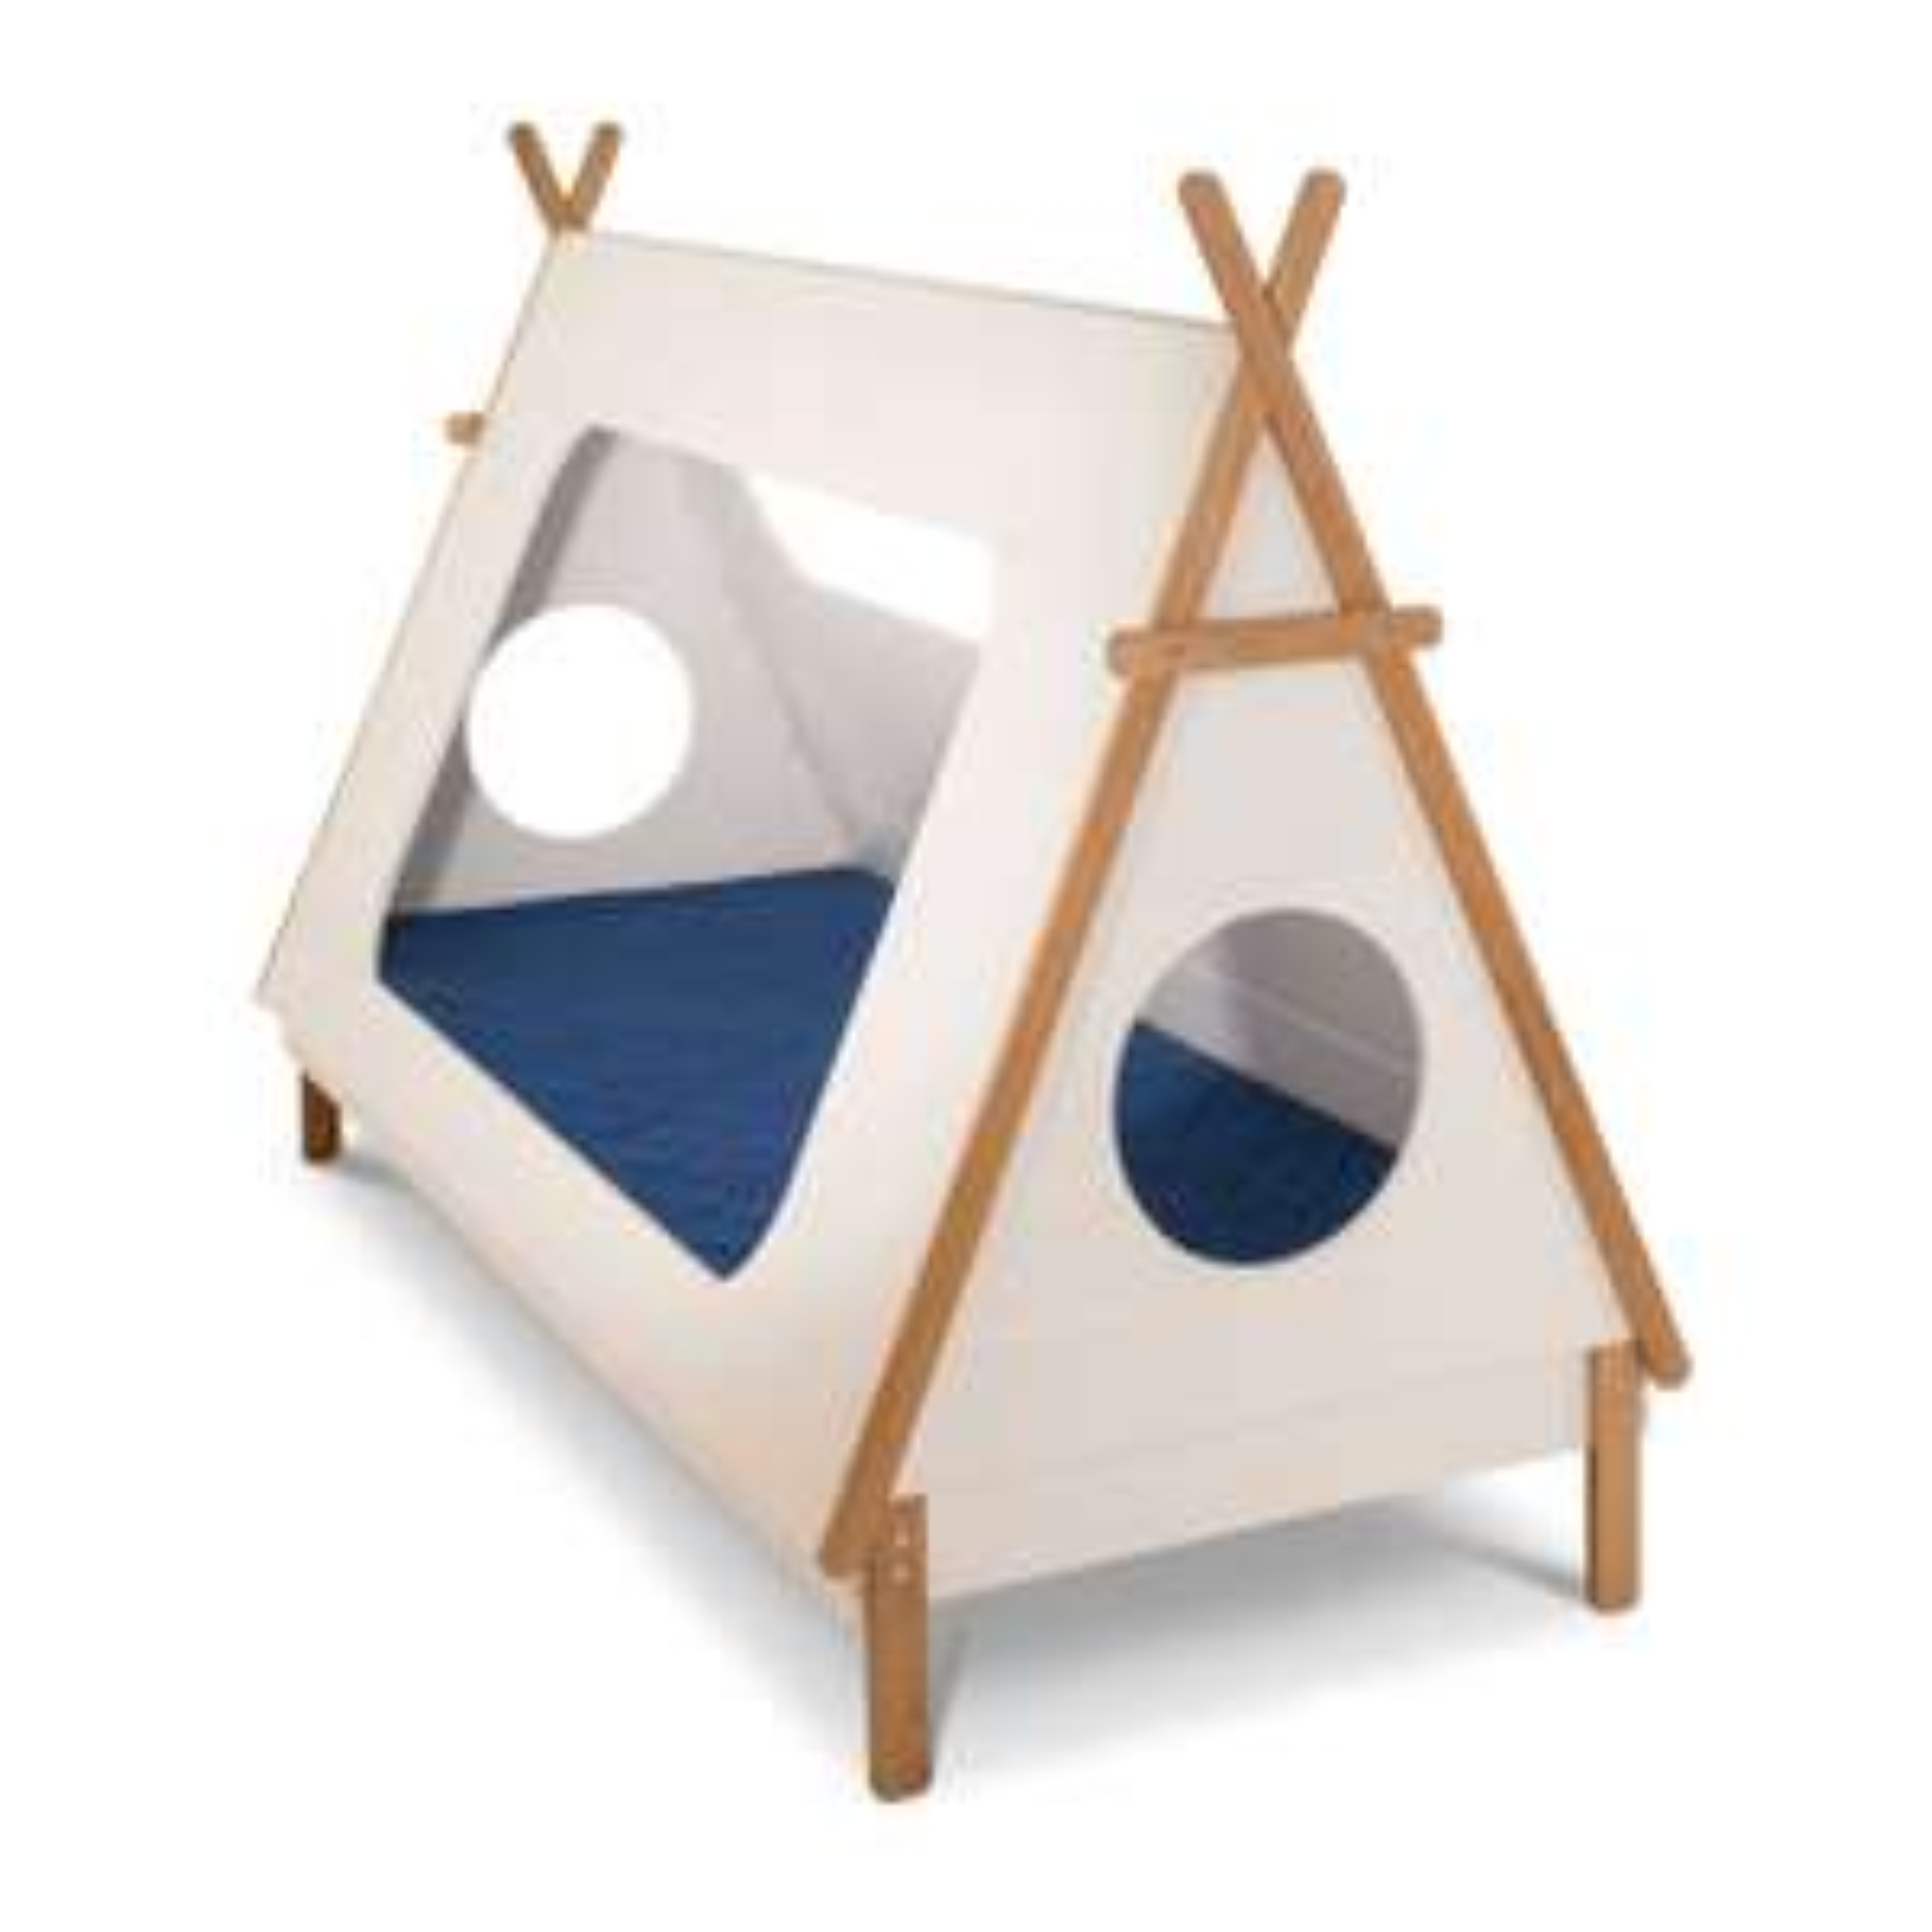 "Kinderbett ""Tipi"" (90 x 200 cm) für 258,95€ inkl. Versand / 229€ bei Abholung [SEGMÜLLER]"